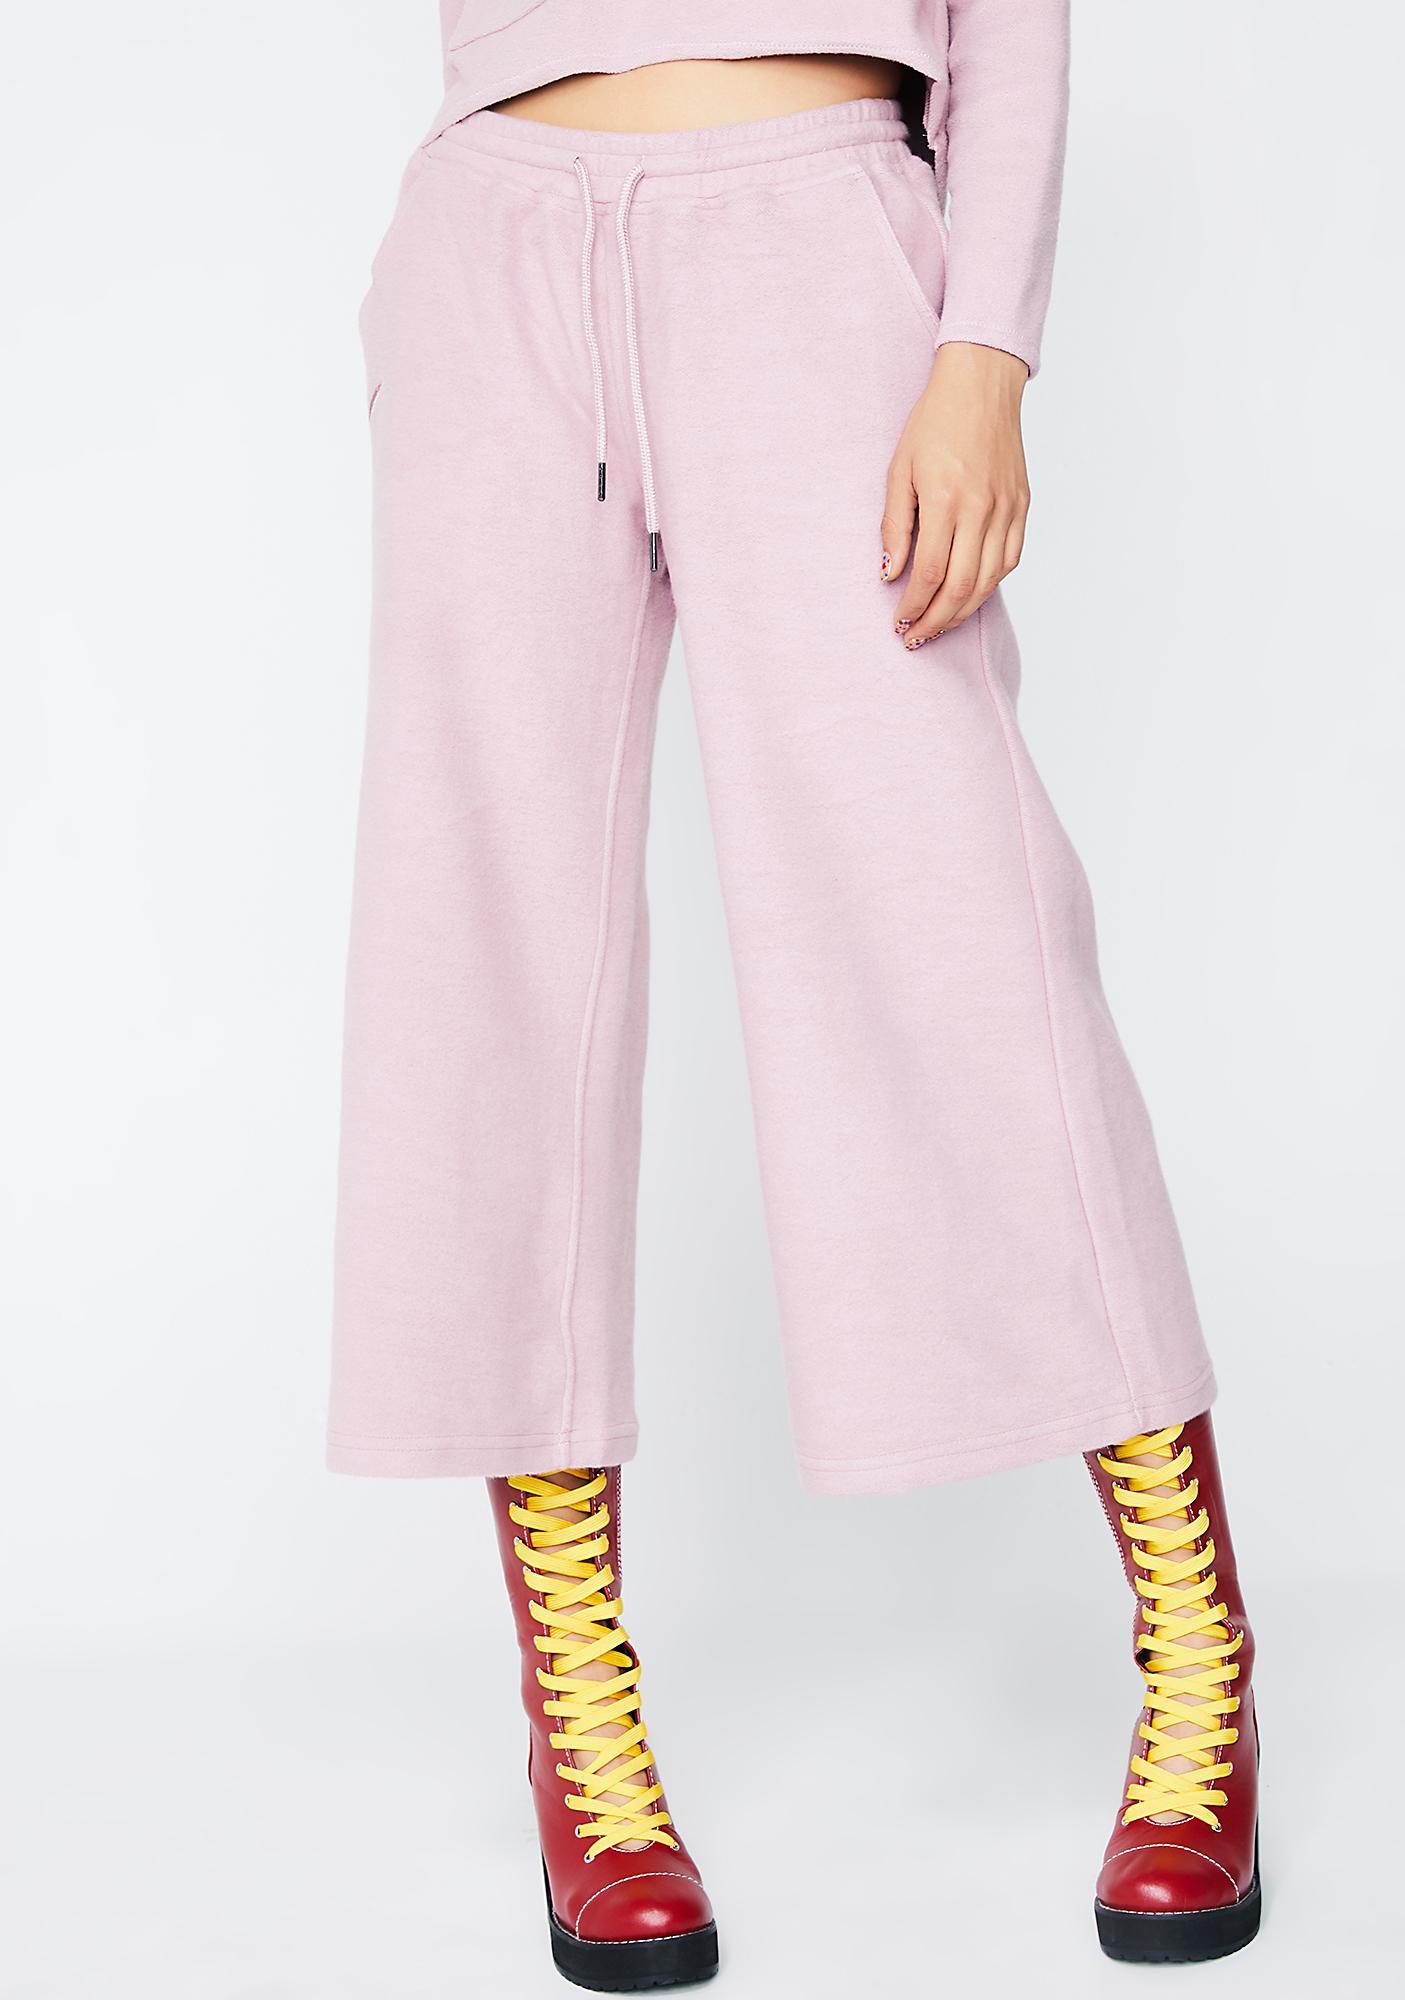 Publish Jazzy Ankle Pants